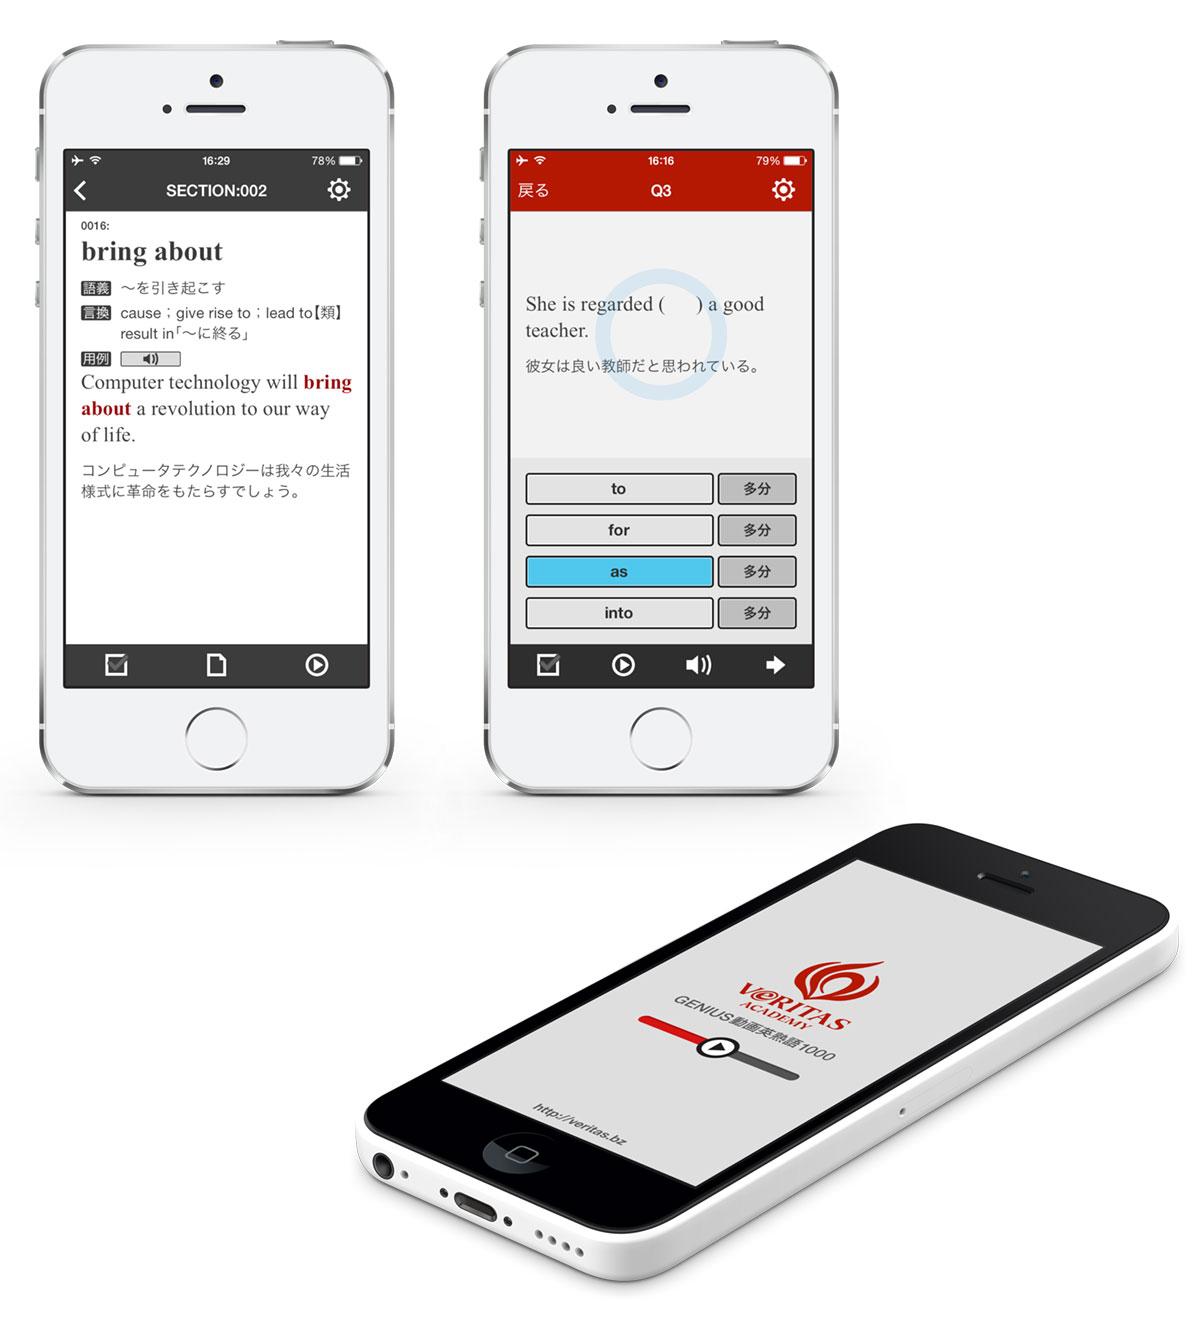 GENIUS動画英文法1000アプリの画面イメージ写真